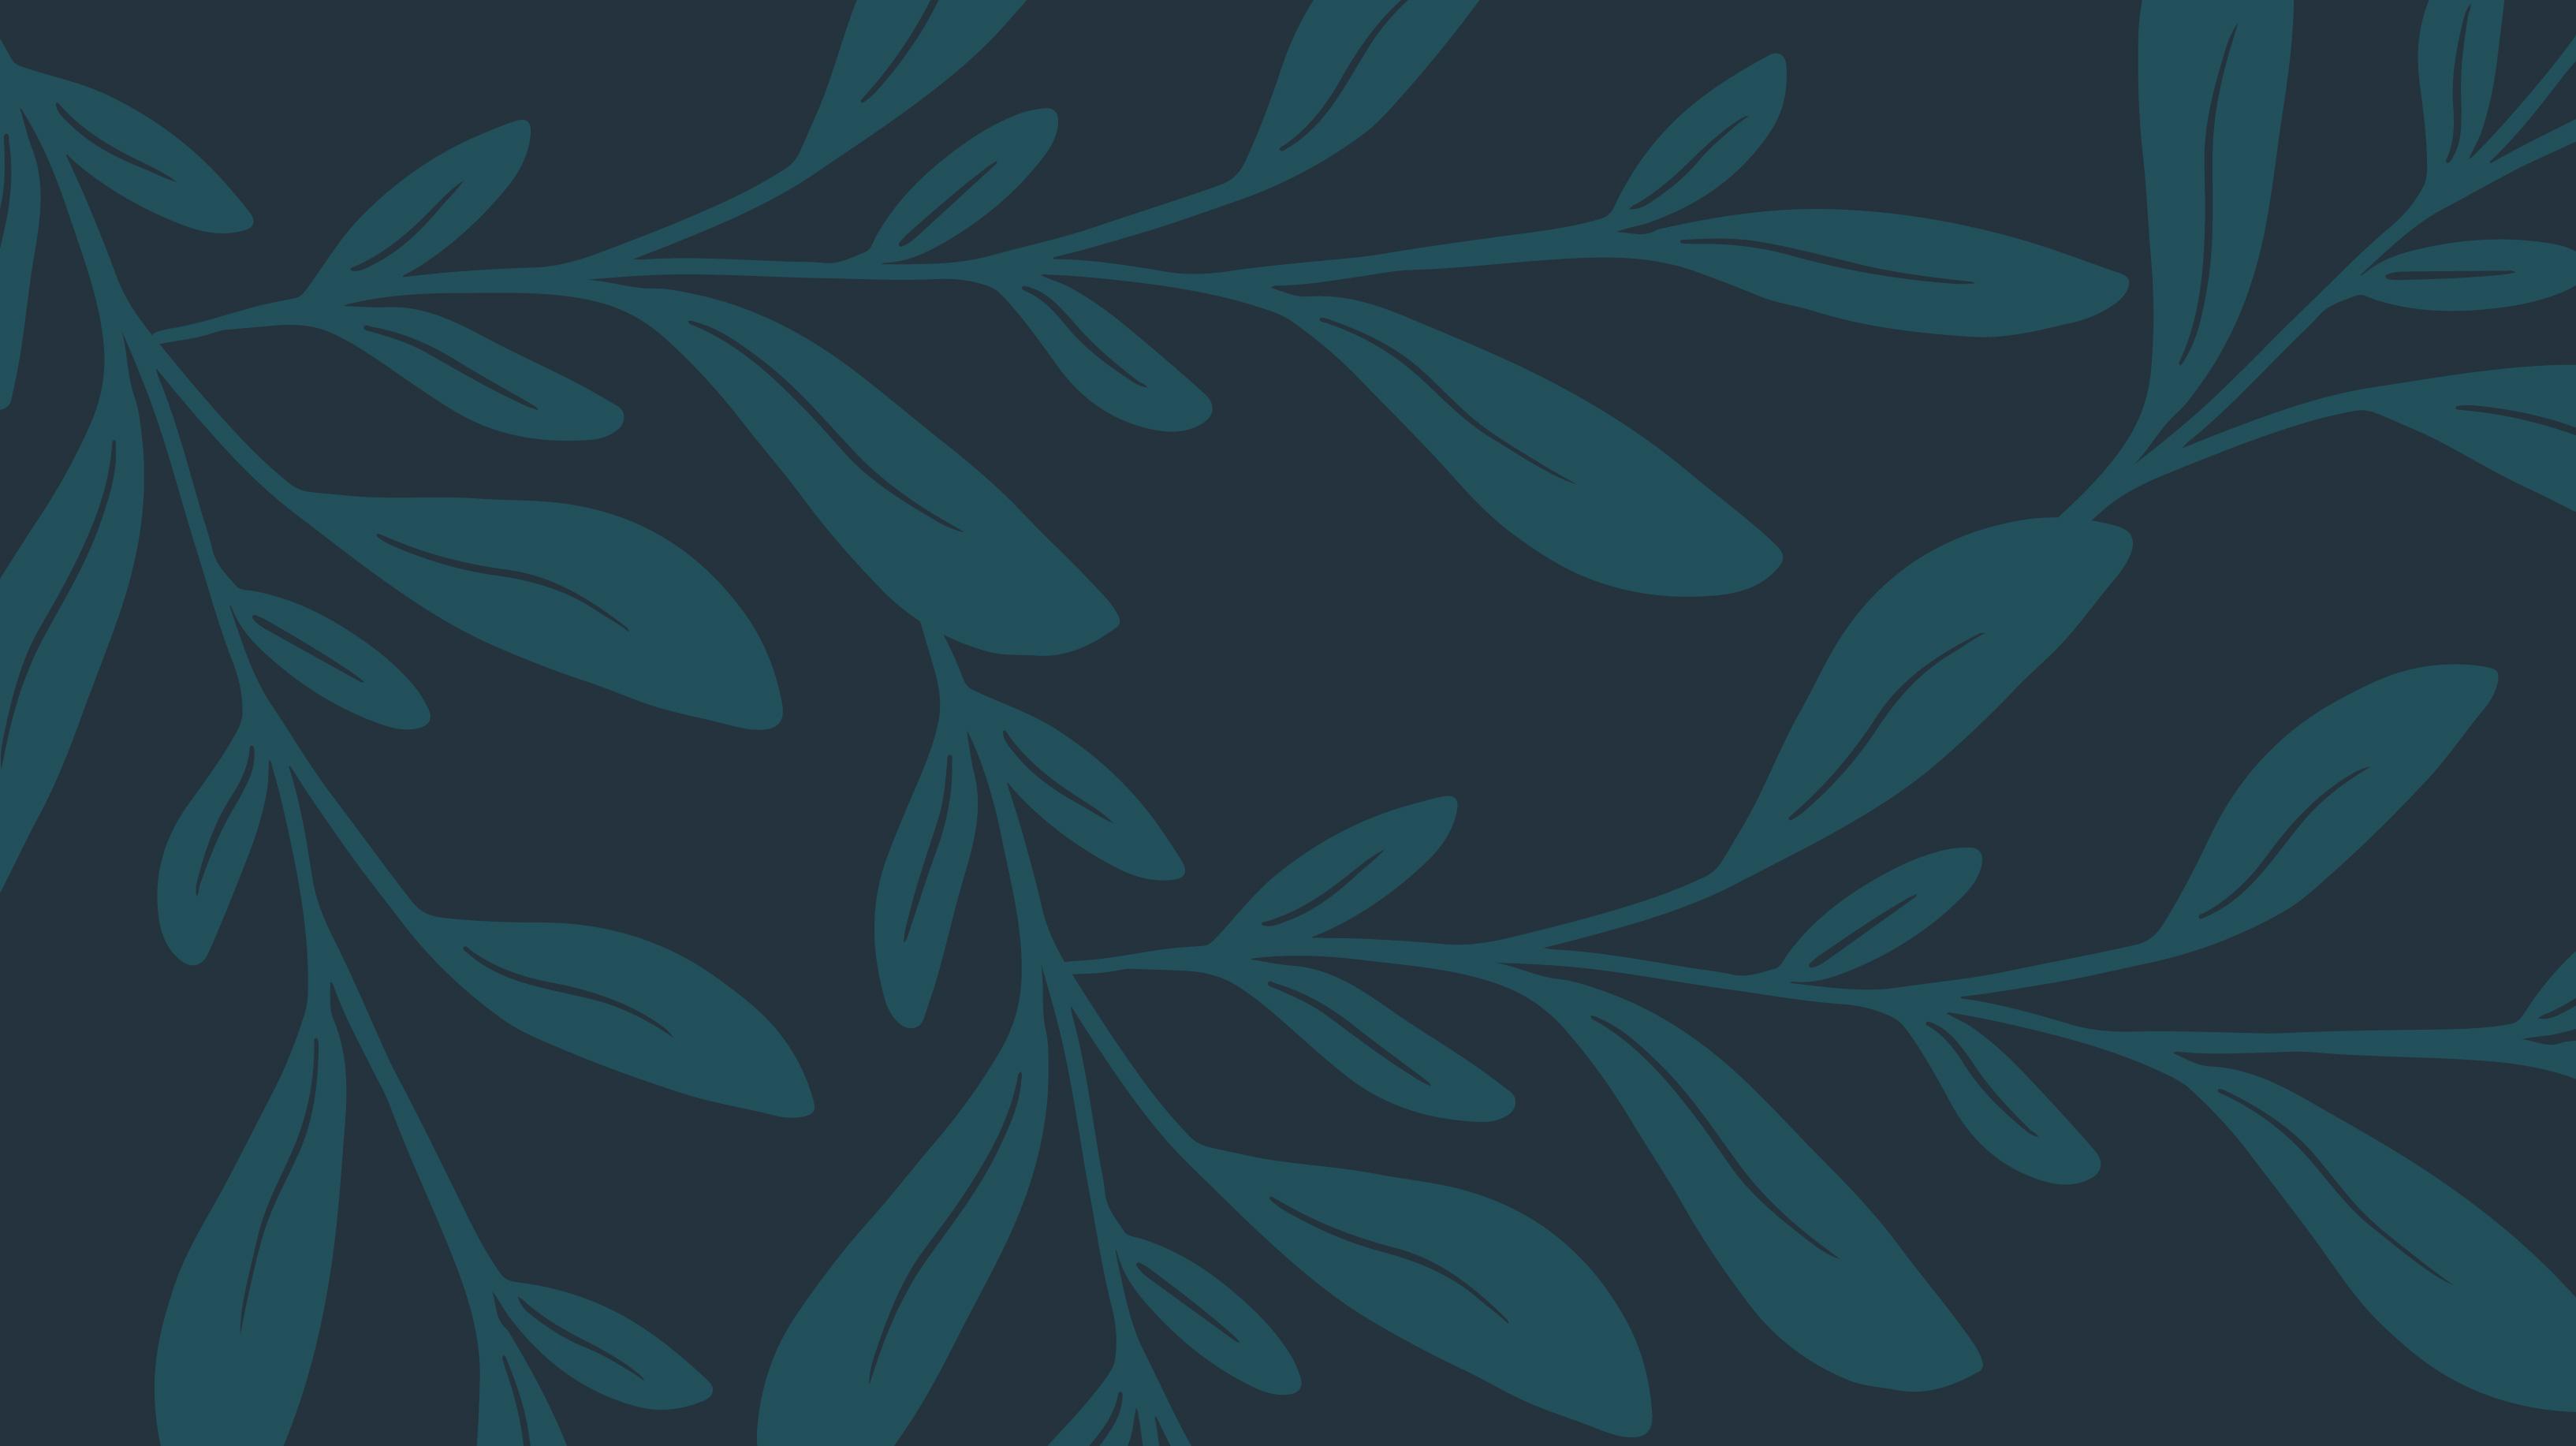 A blue pattern of leafy elements.